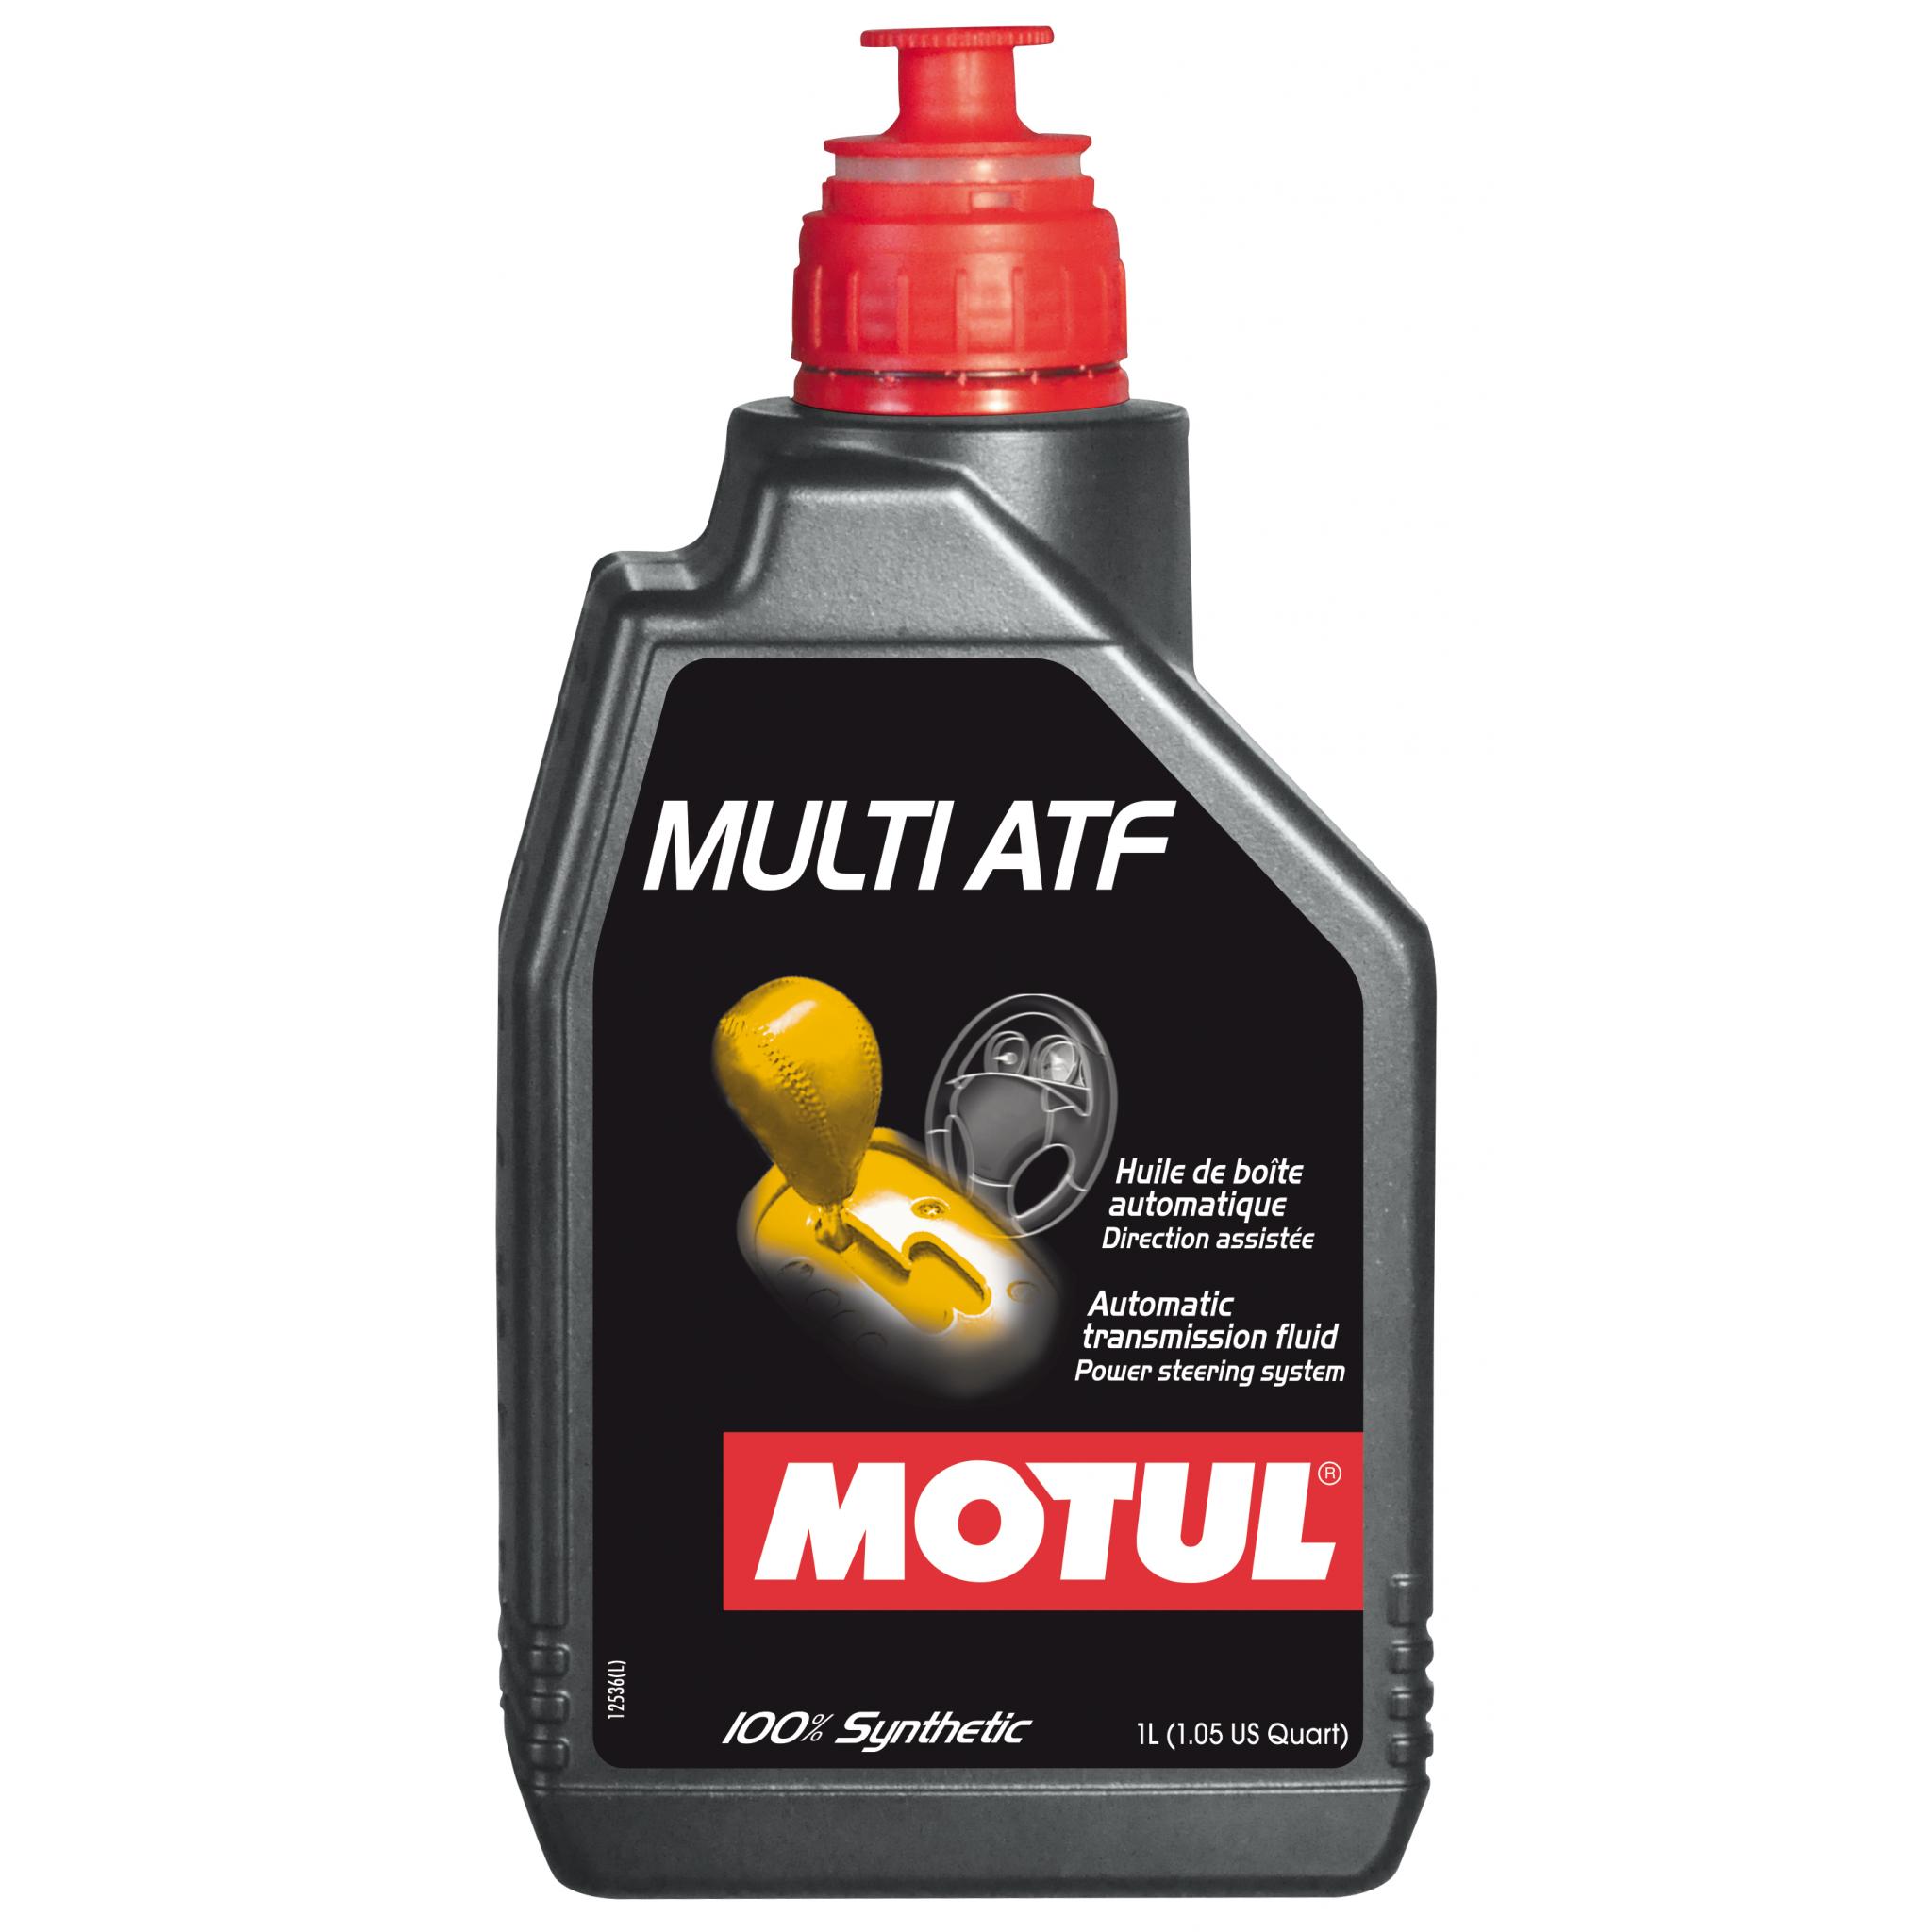 Motul MULTI ATF - 1L - Fully Synthetic Transmission fluid